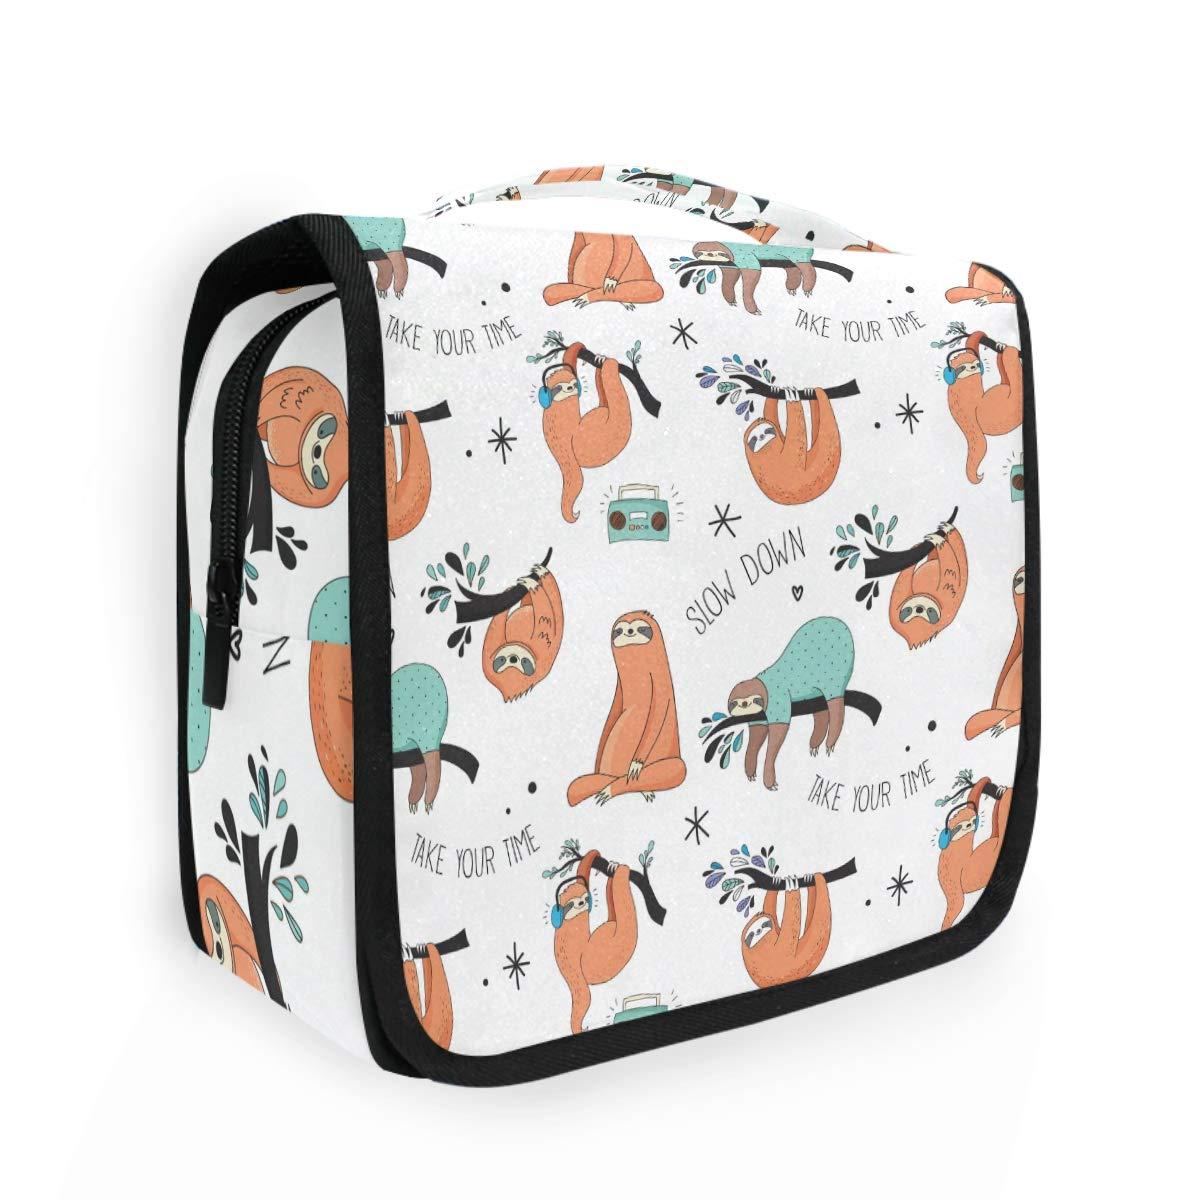 CaTaKu Animal Cute Lazy Sloth Cosmetic Bag Toiletry Bag Multifunction Bag Cosmetic Portable Makeup Waterproof Travel Hanging Organizer Bag for Men & Women